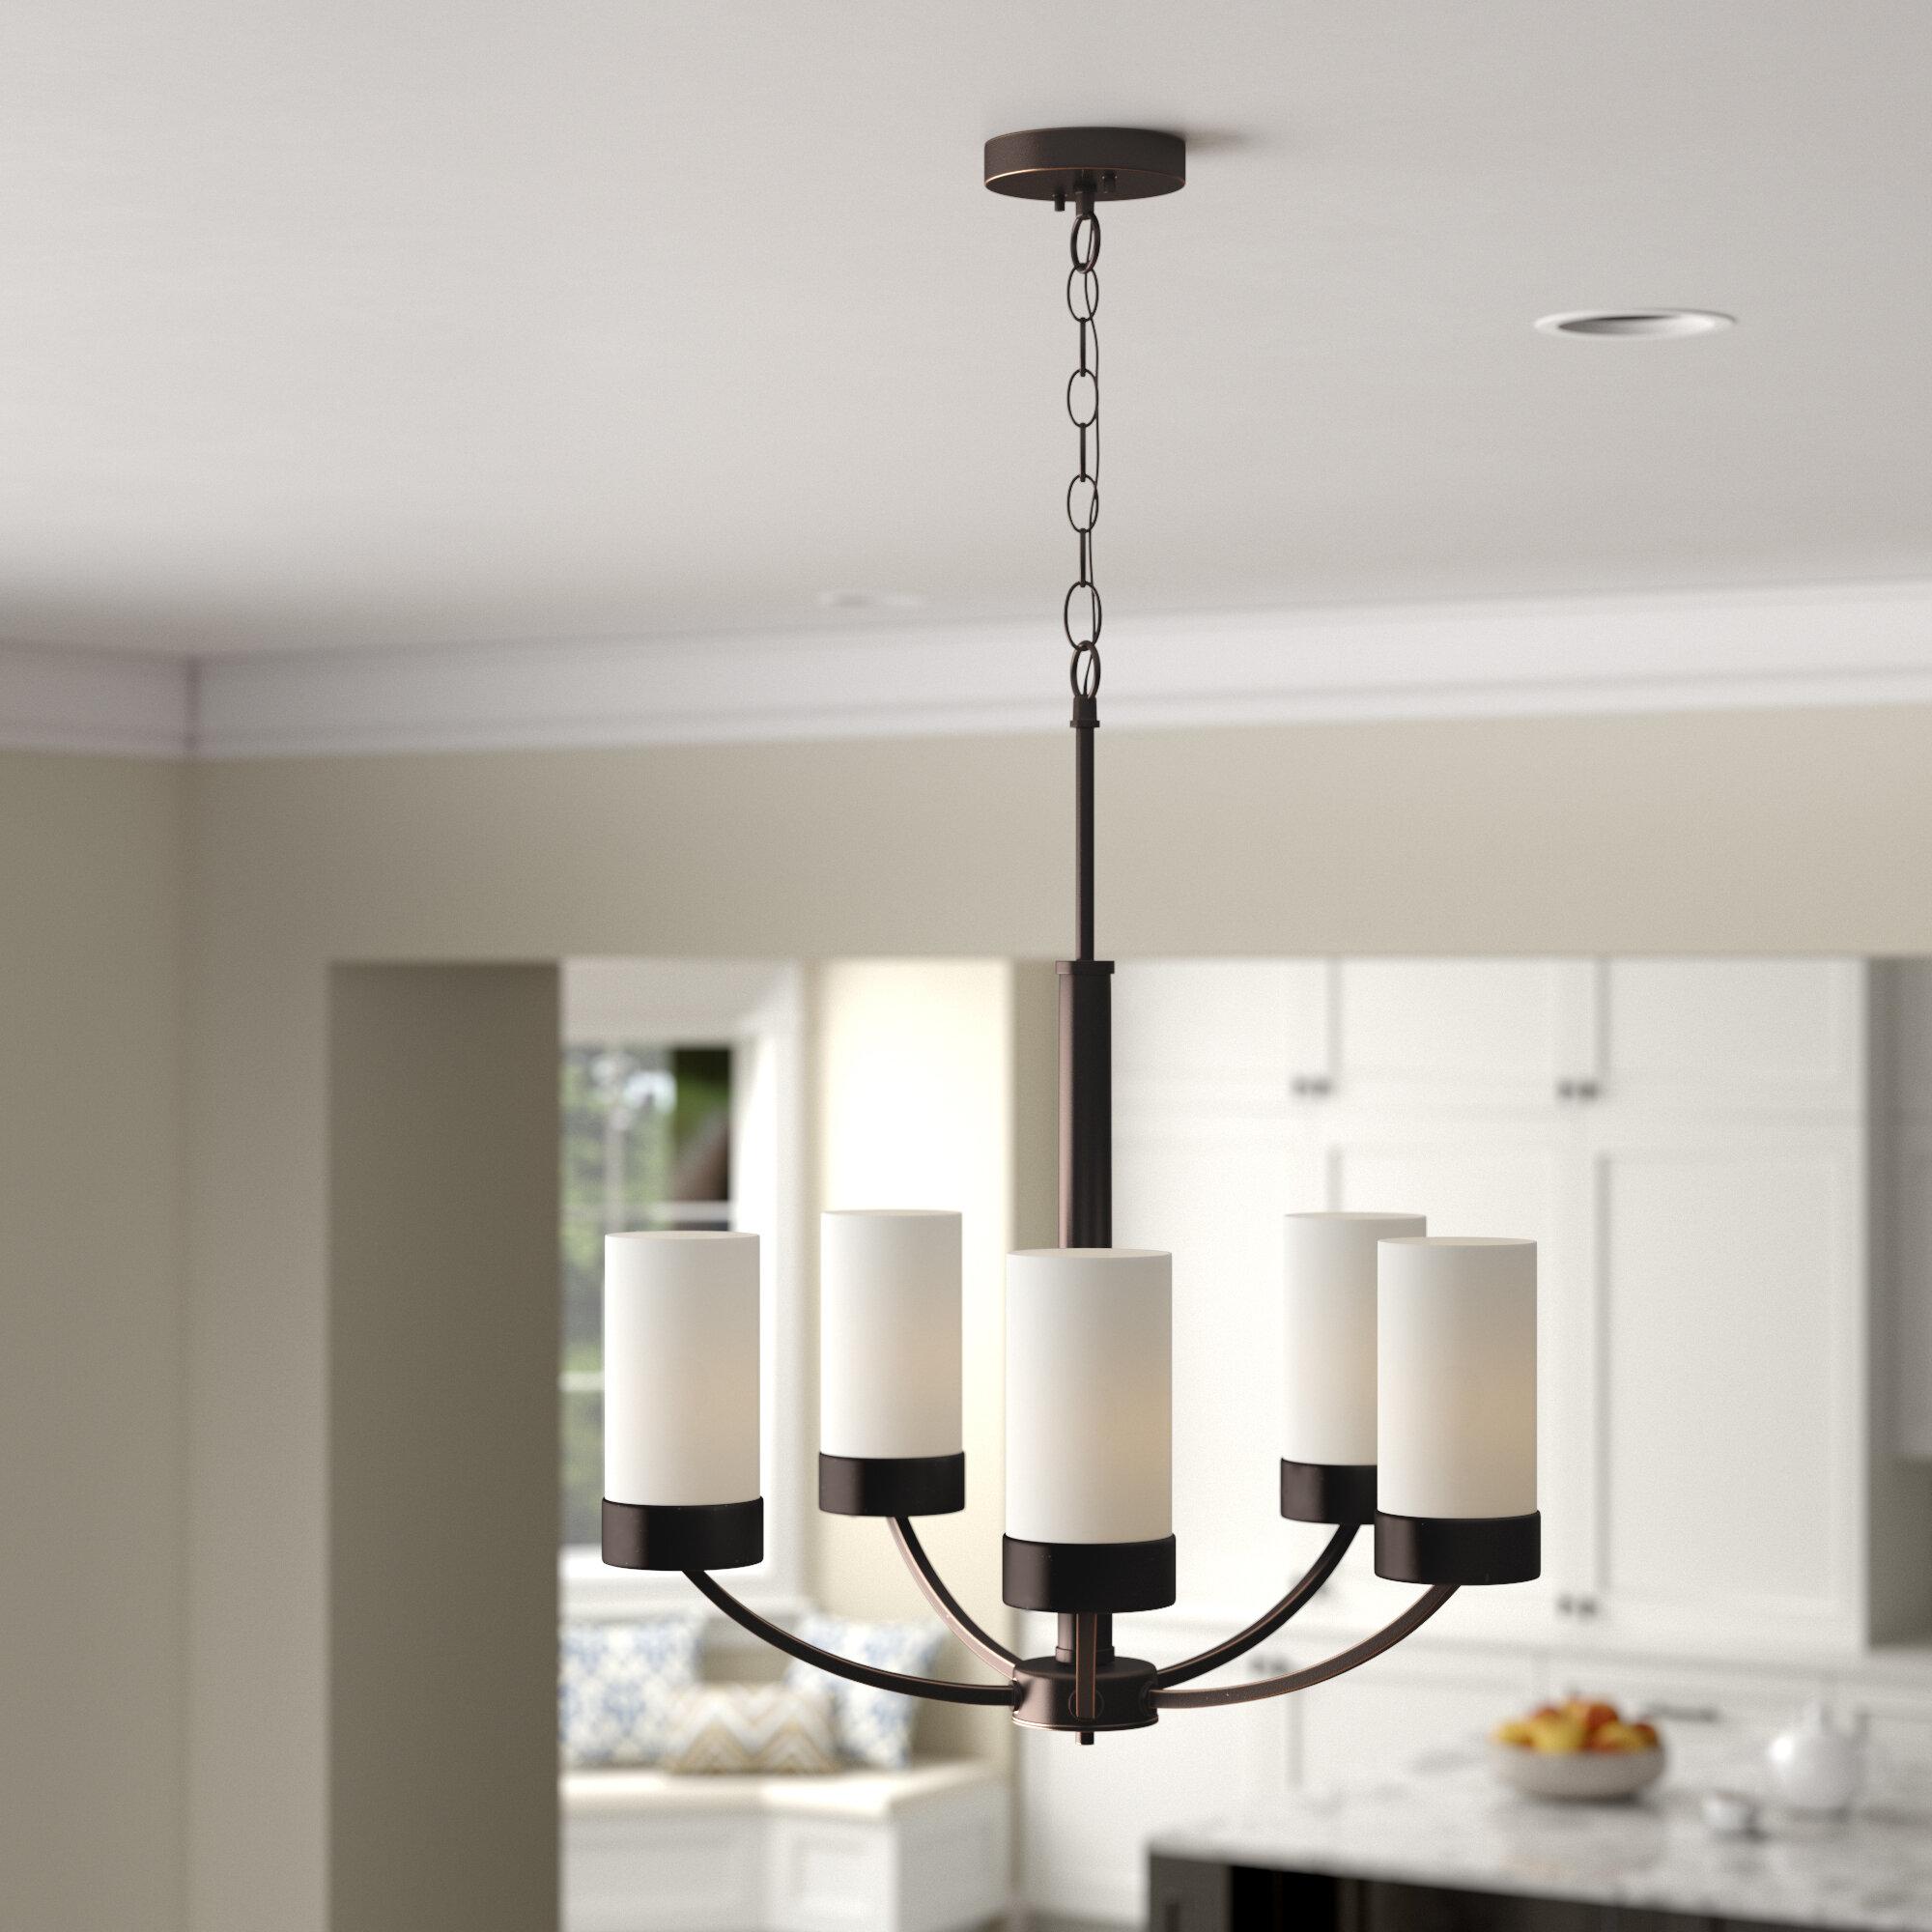 Andover mills sanderson 5 light shaded chandelier reviews wayfair